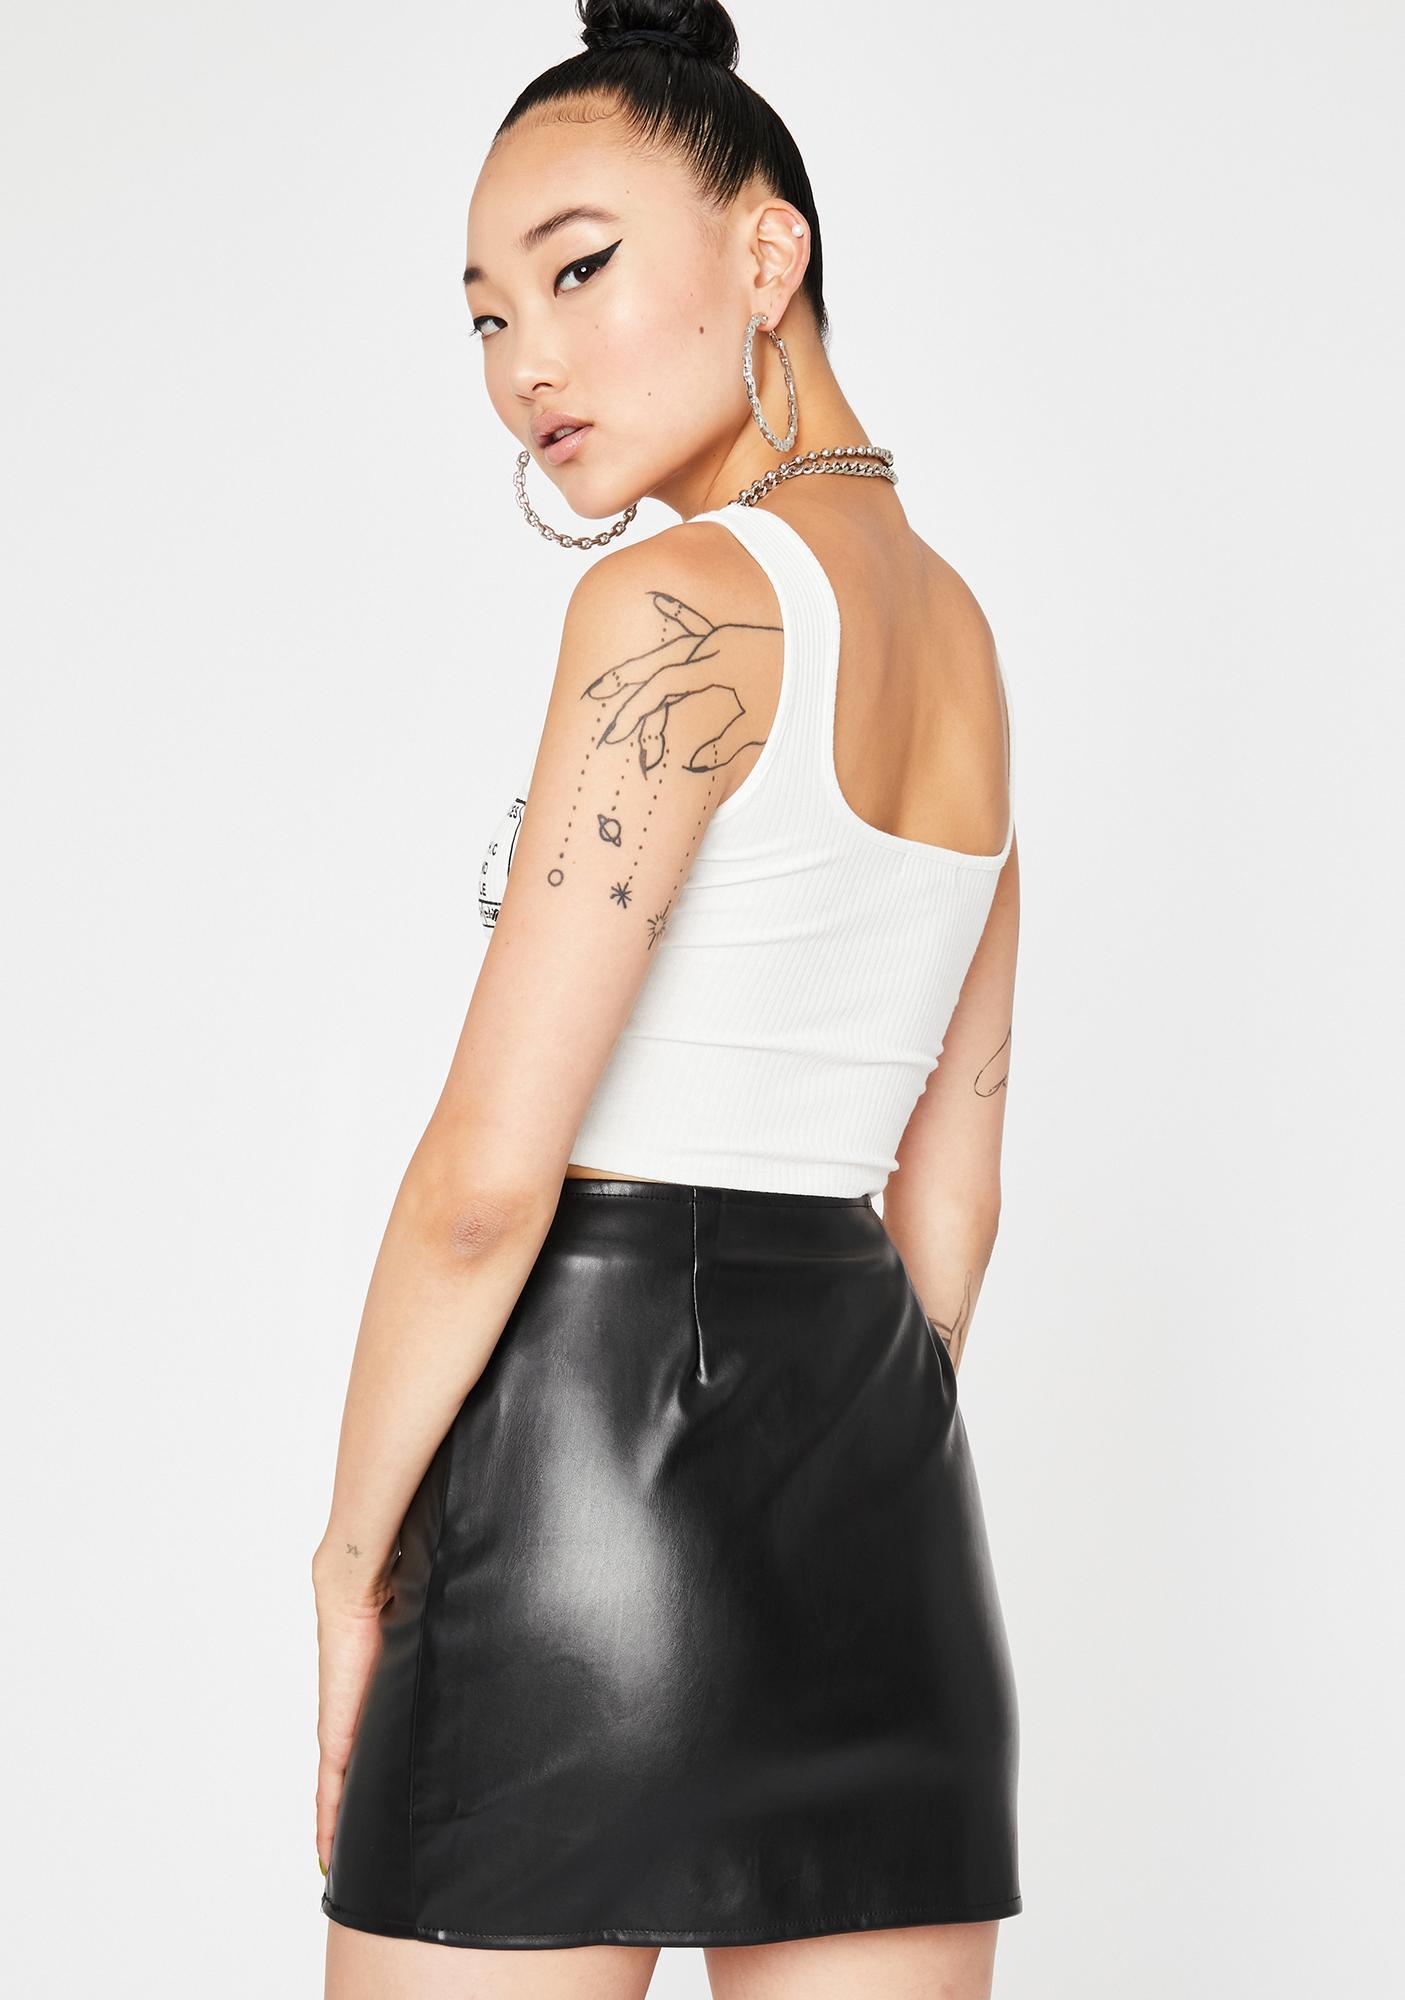 Dark Too Hawt To Touch Mini Skirt